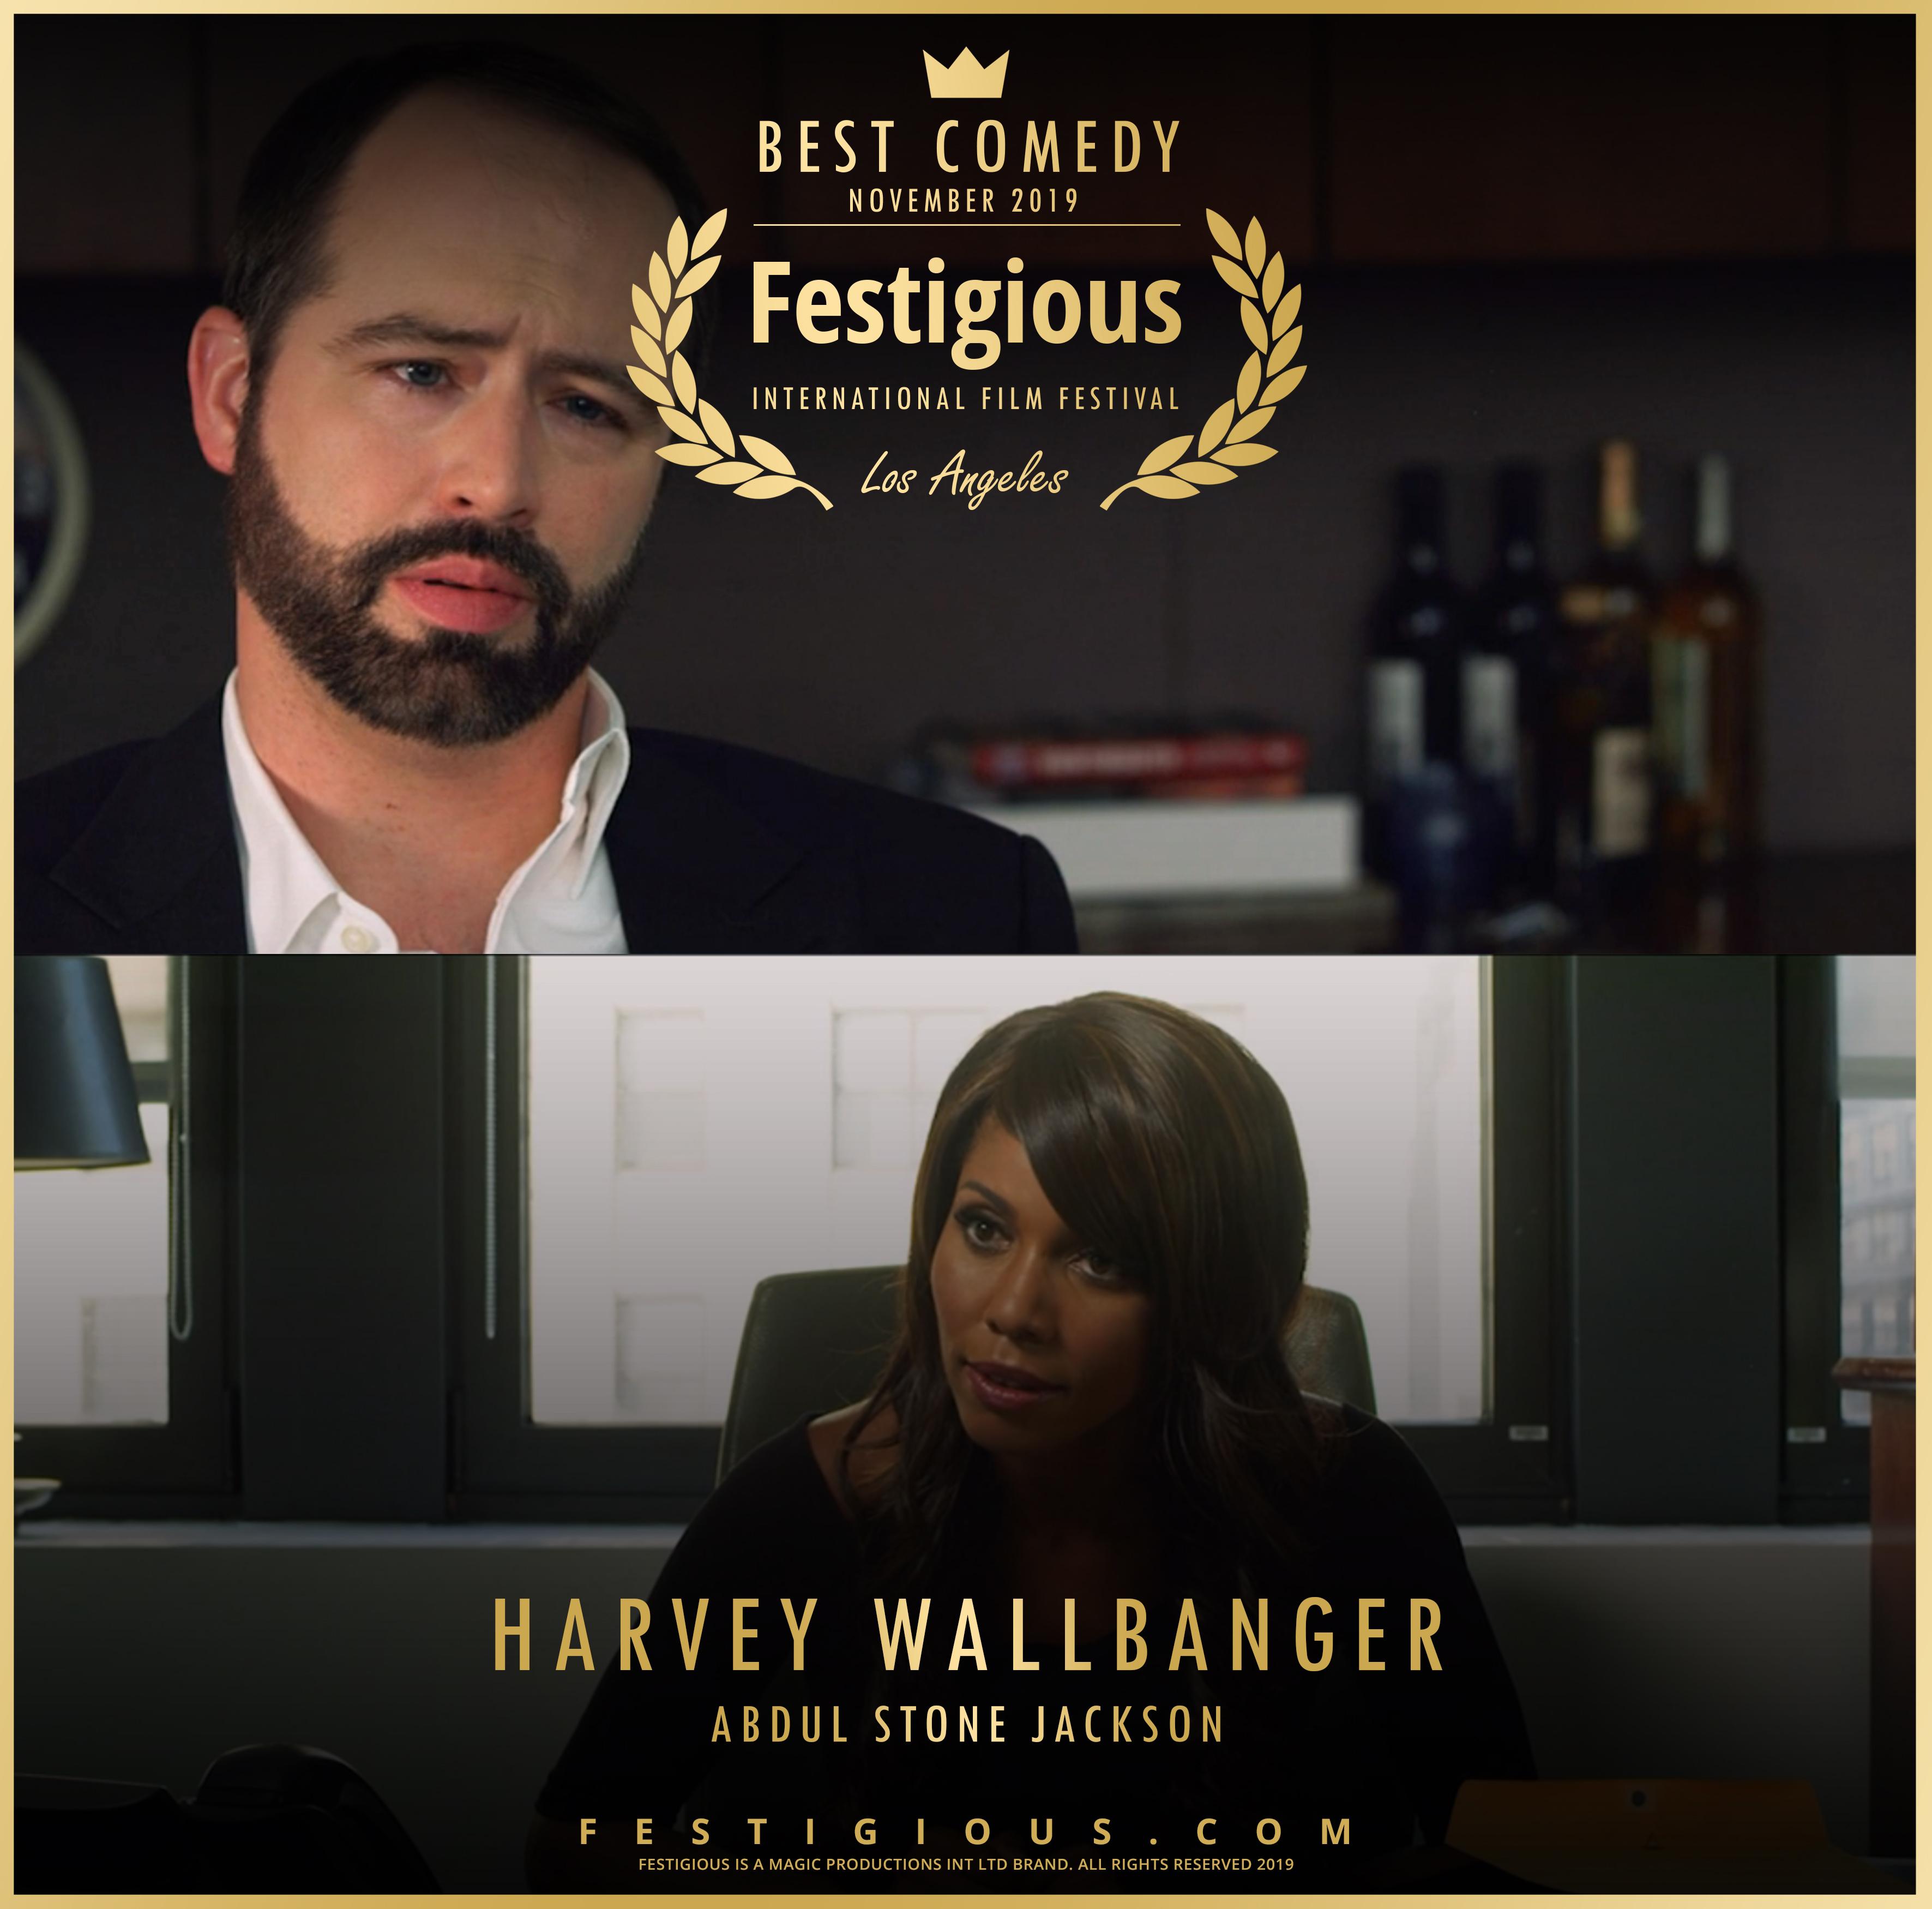 Harvey Wallbanger design